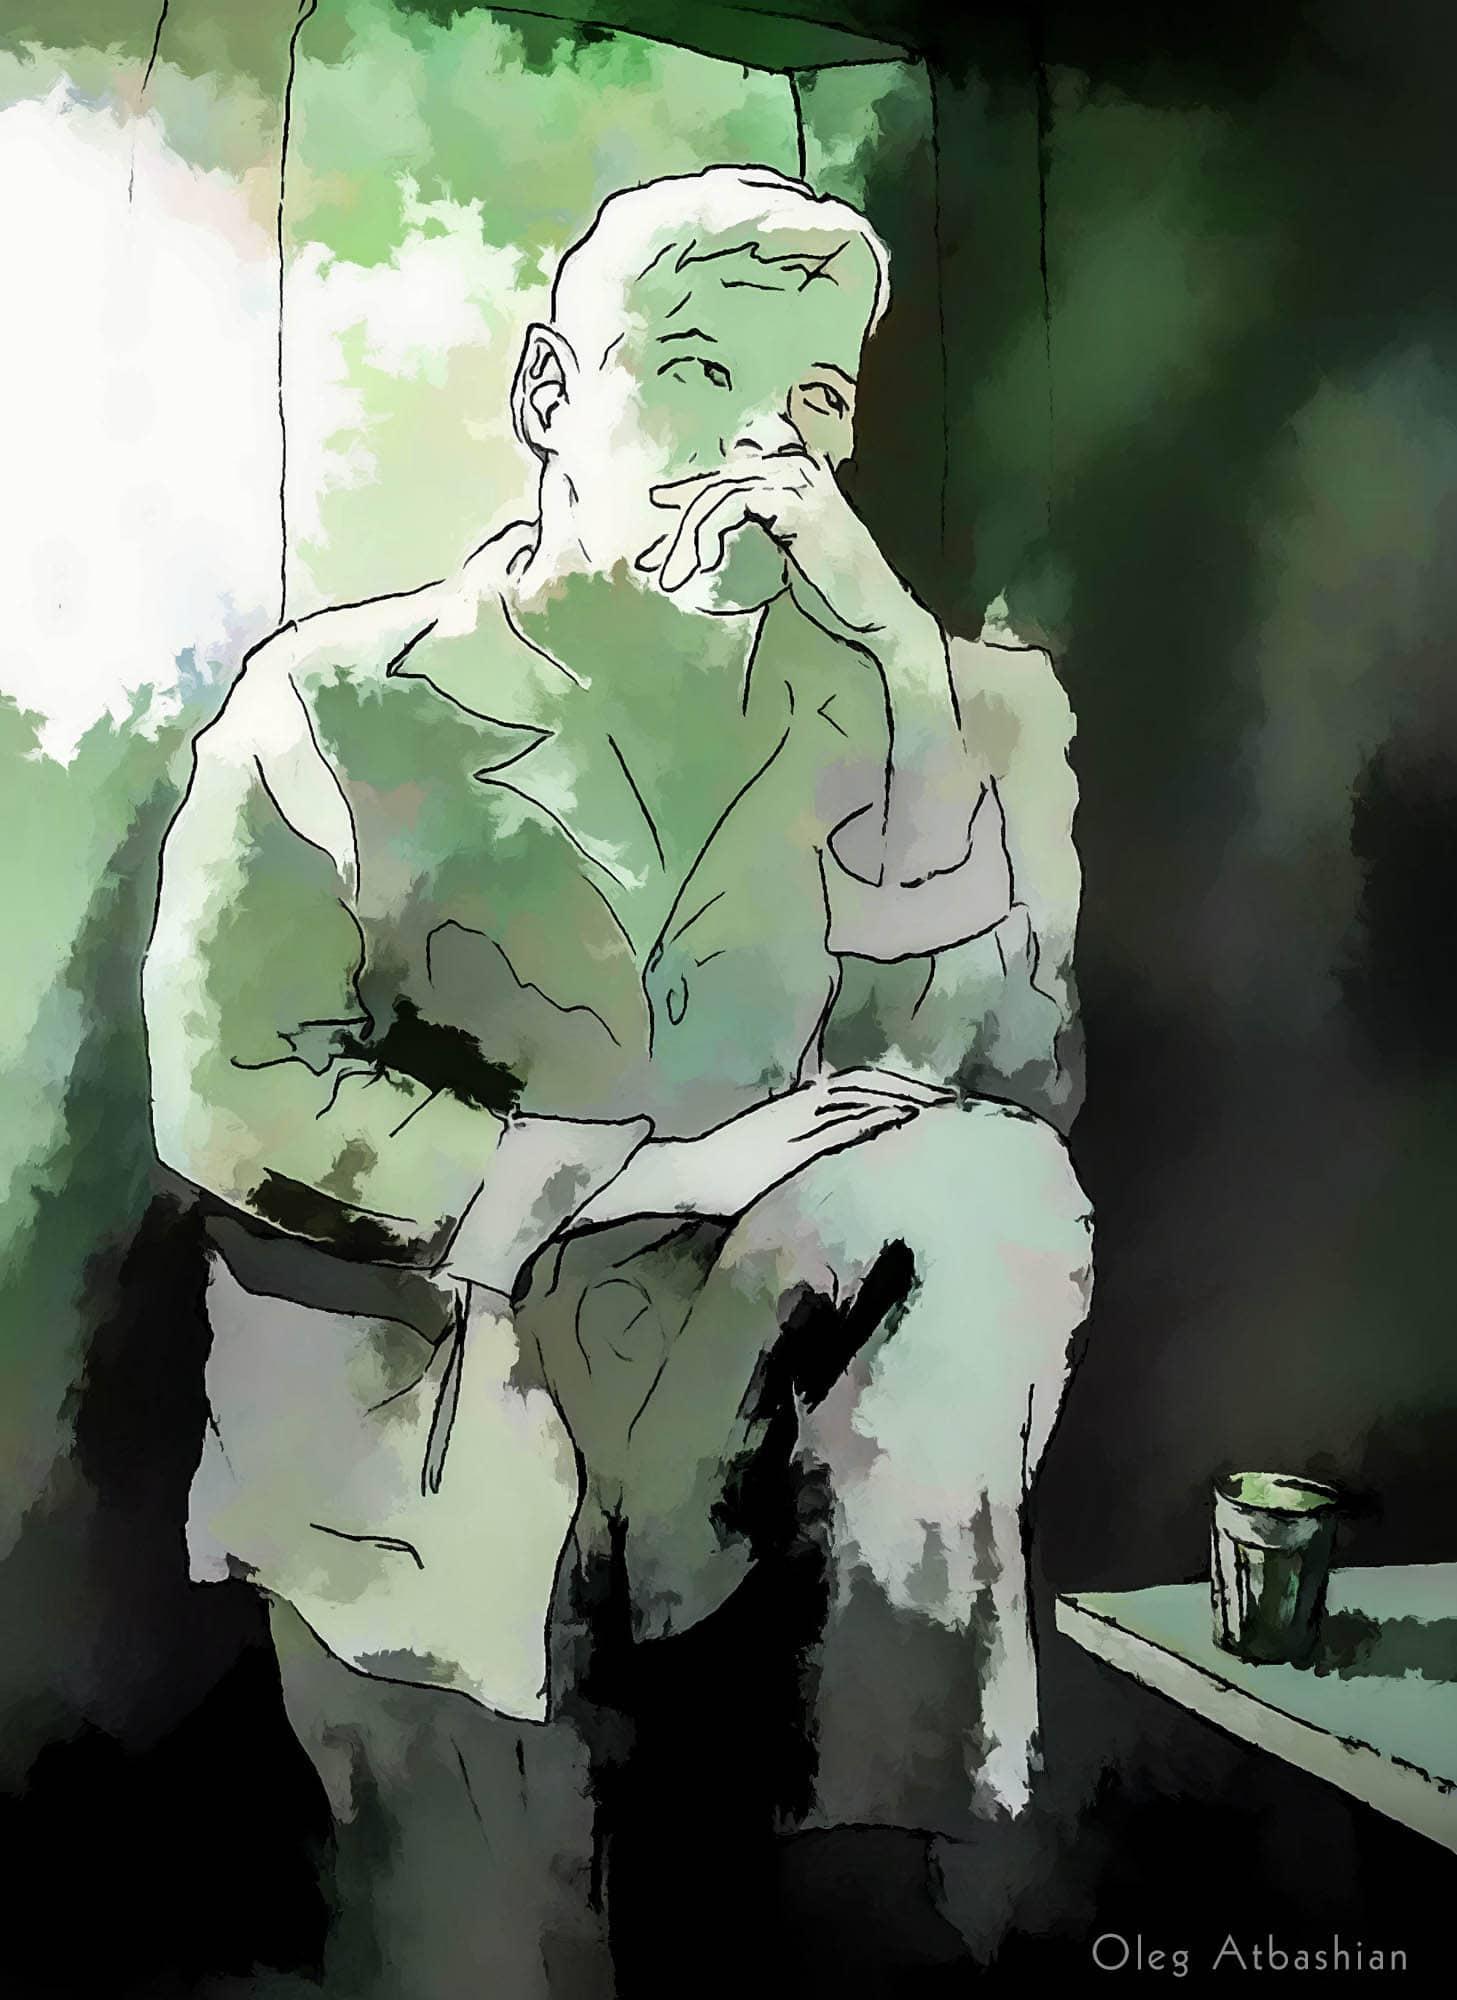 Korepanov the Thinker